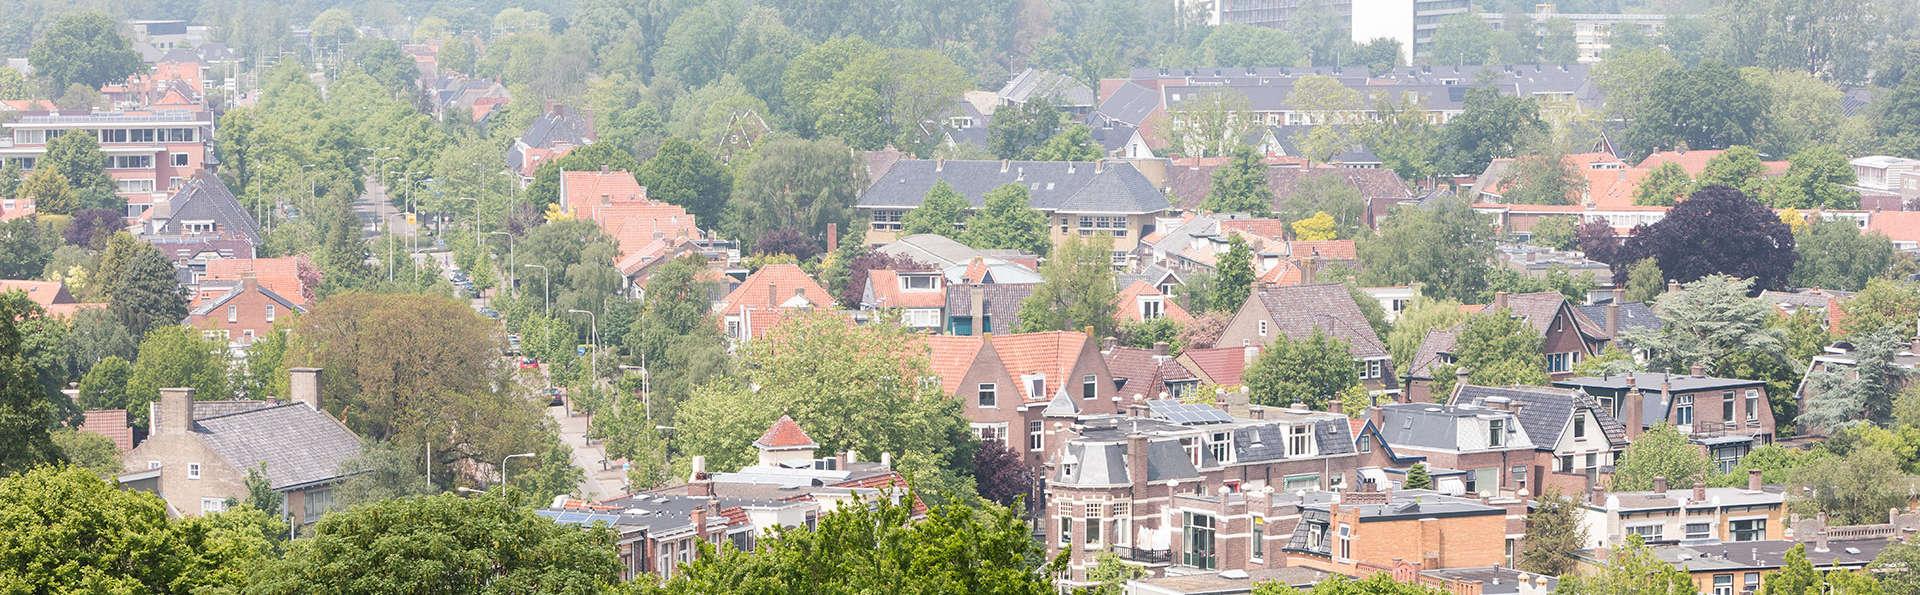 Bastion Hotel Leeuwarden - Edit_Leeuwarden.jpg